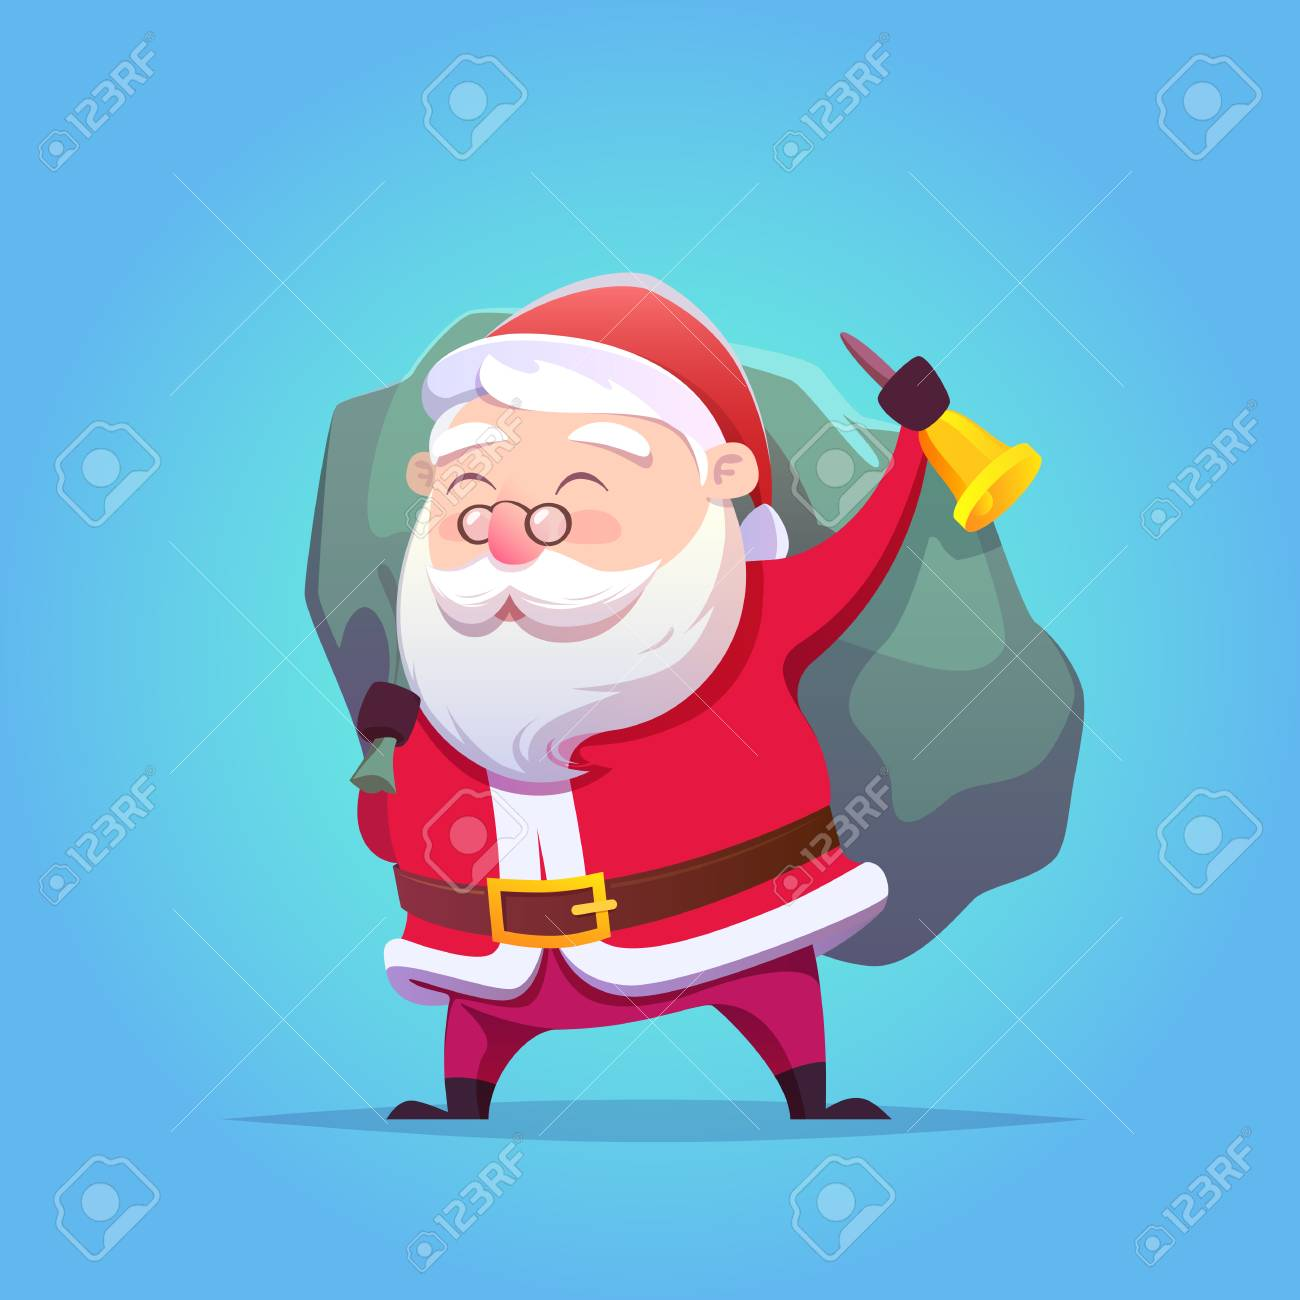 Cartoon Santa Claus. Vector illustration. Merry Christmas and Happy New Year. Postcard. - 127497900